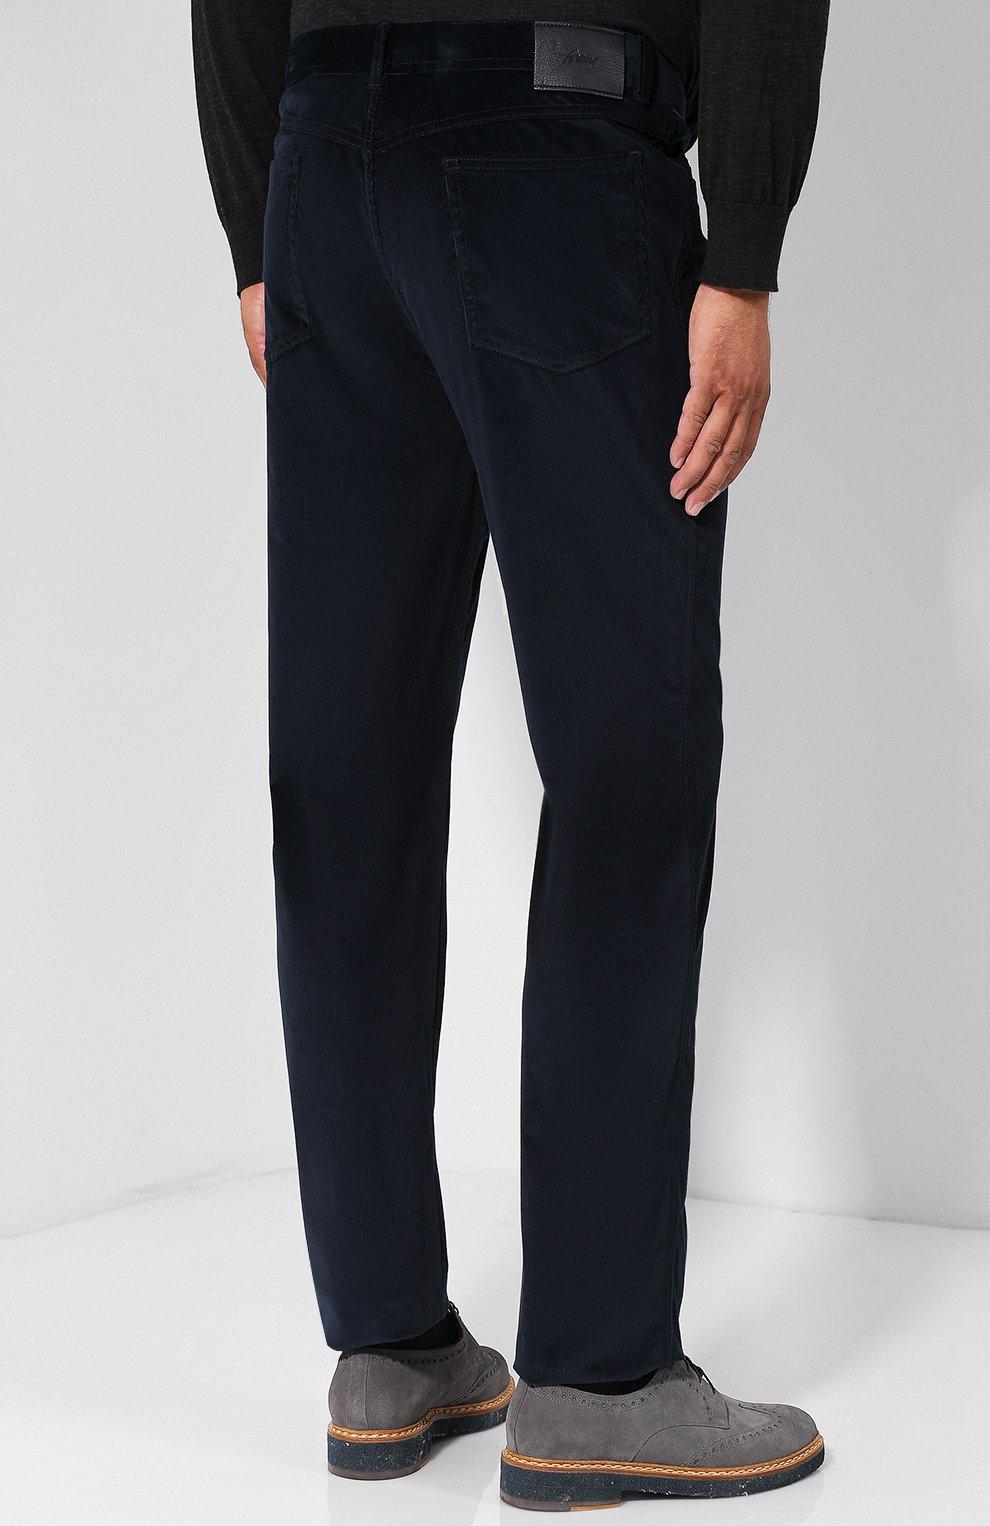 Мужские хлопковые брюки прямого кроя BRIONI темно-синего цвета, арт. SPLE0M/0Z002/CHAM0NIX | Фото 4